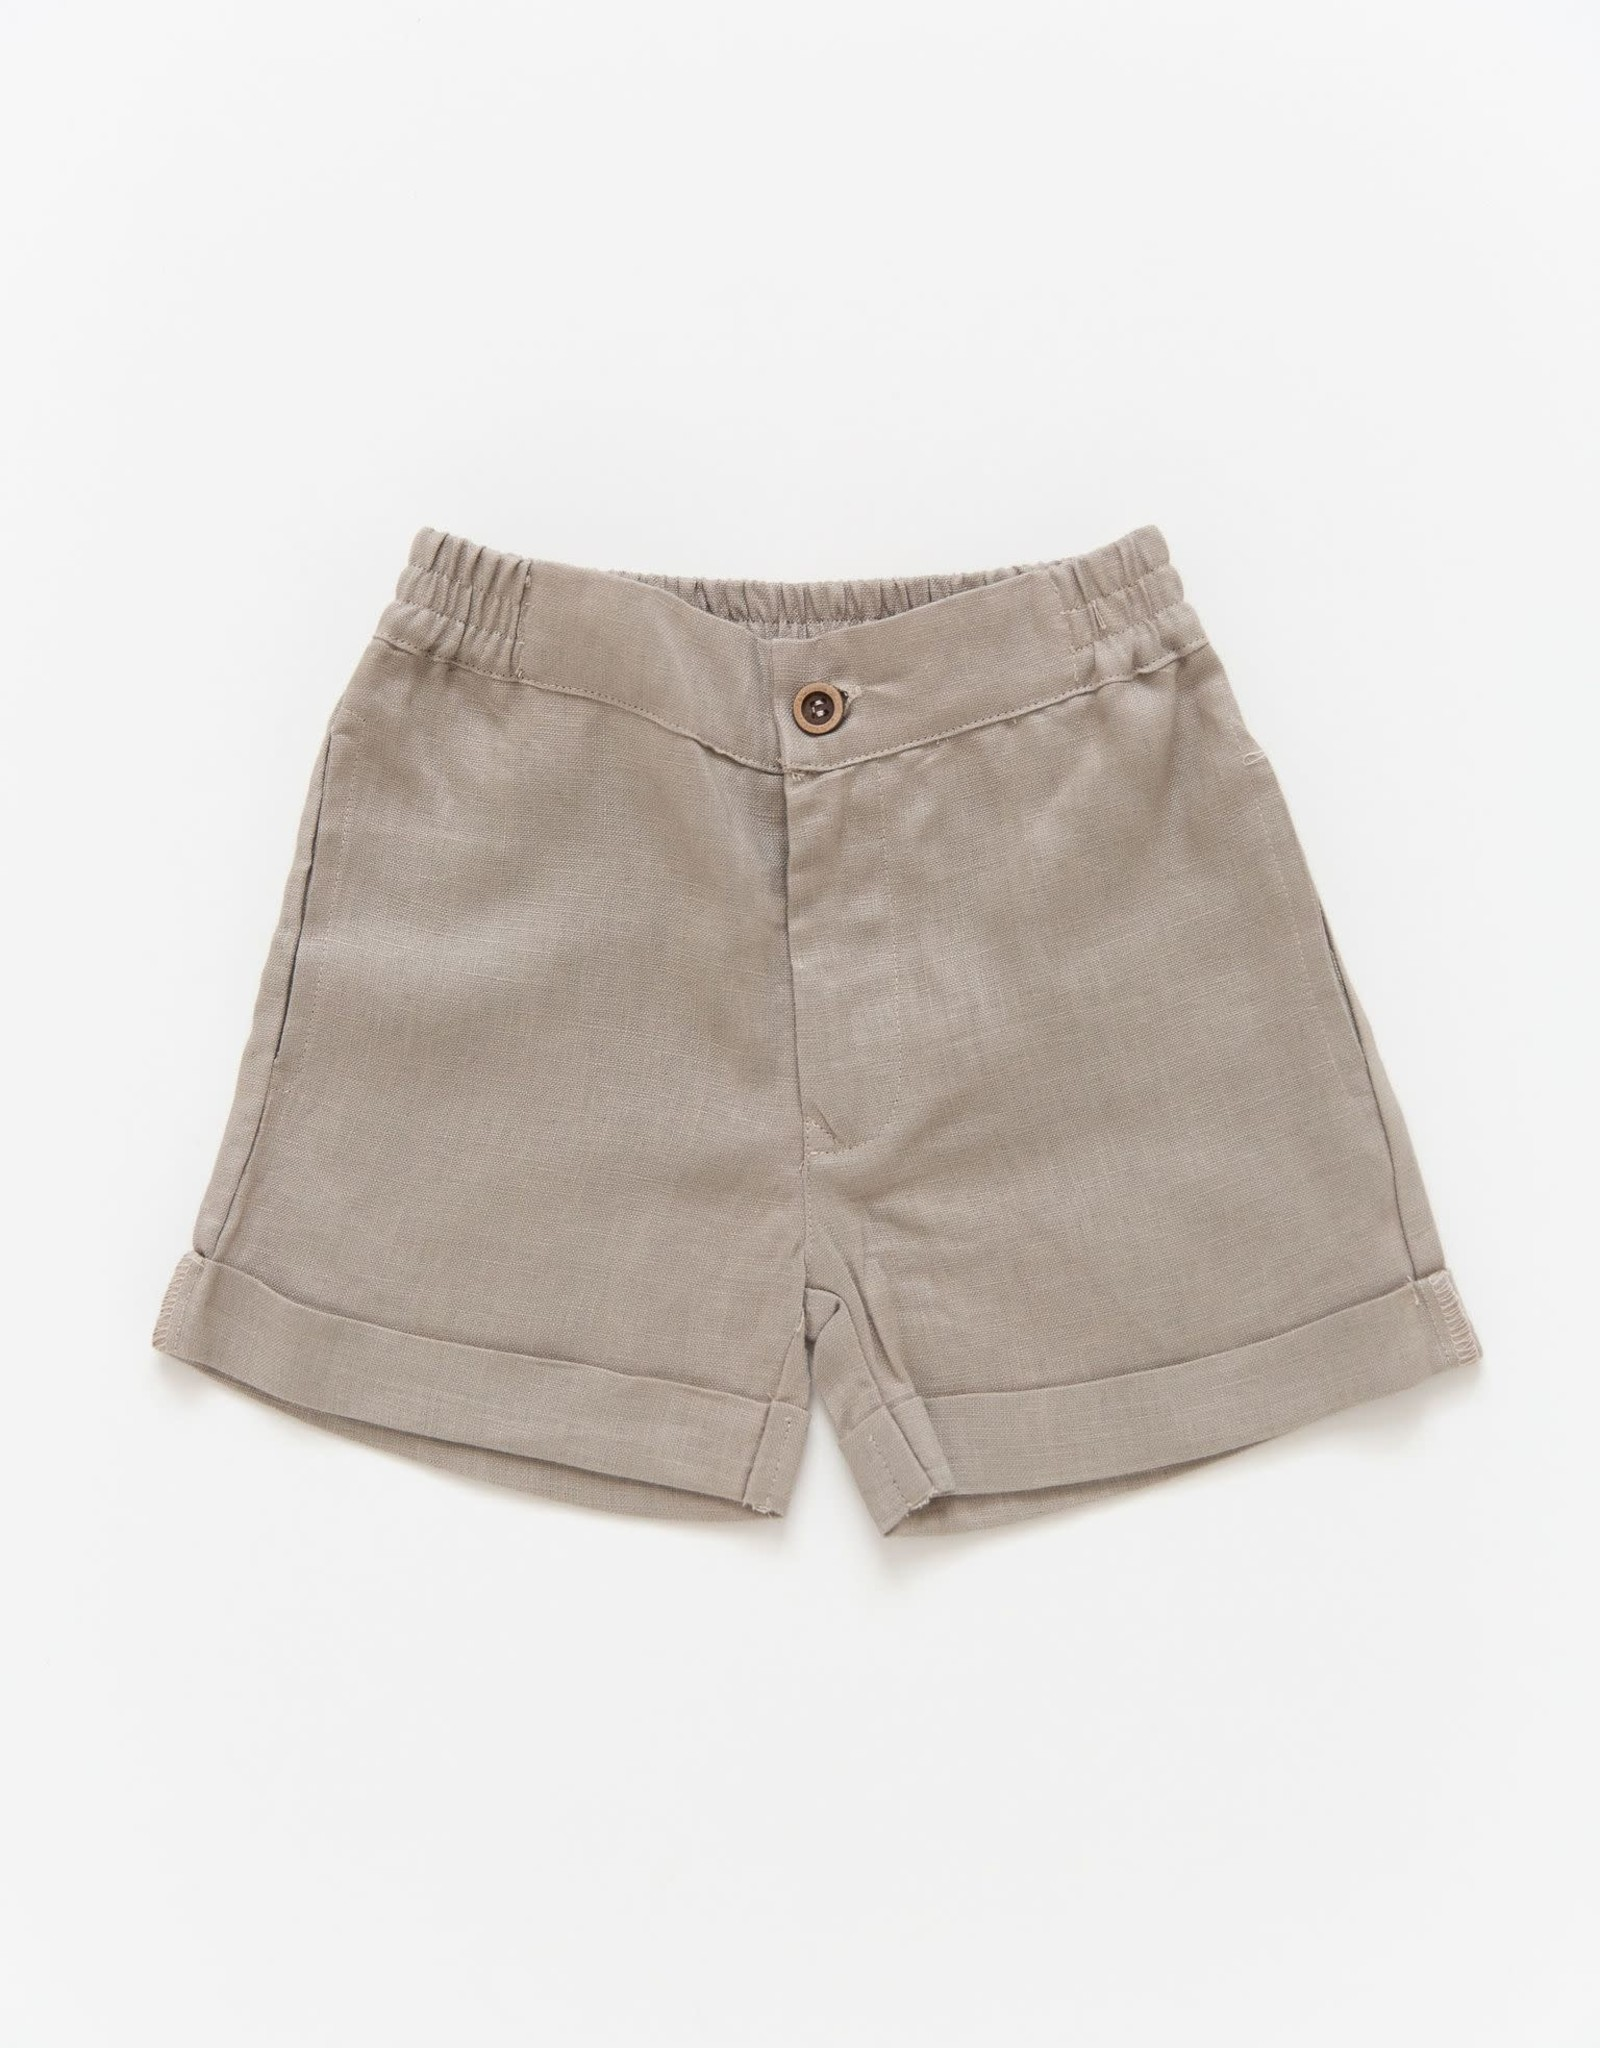 Petite Moss Linen Scottie short